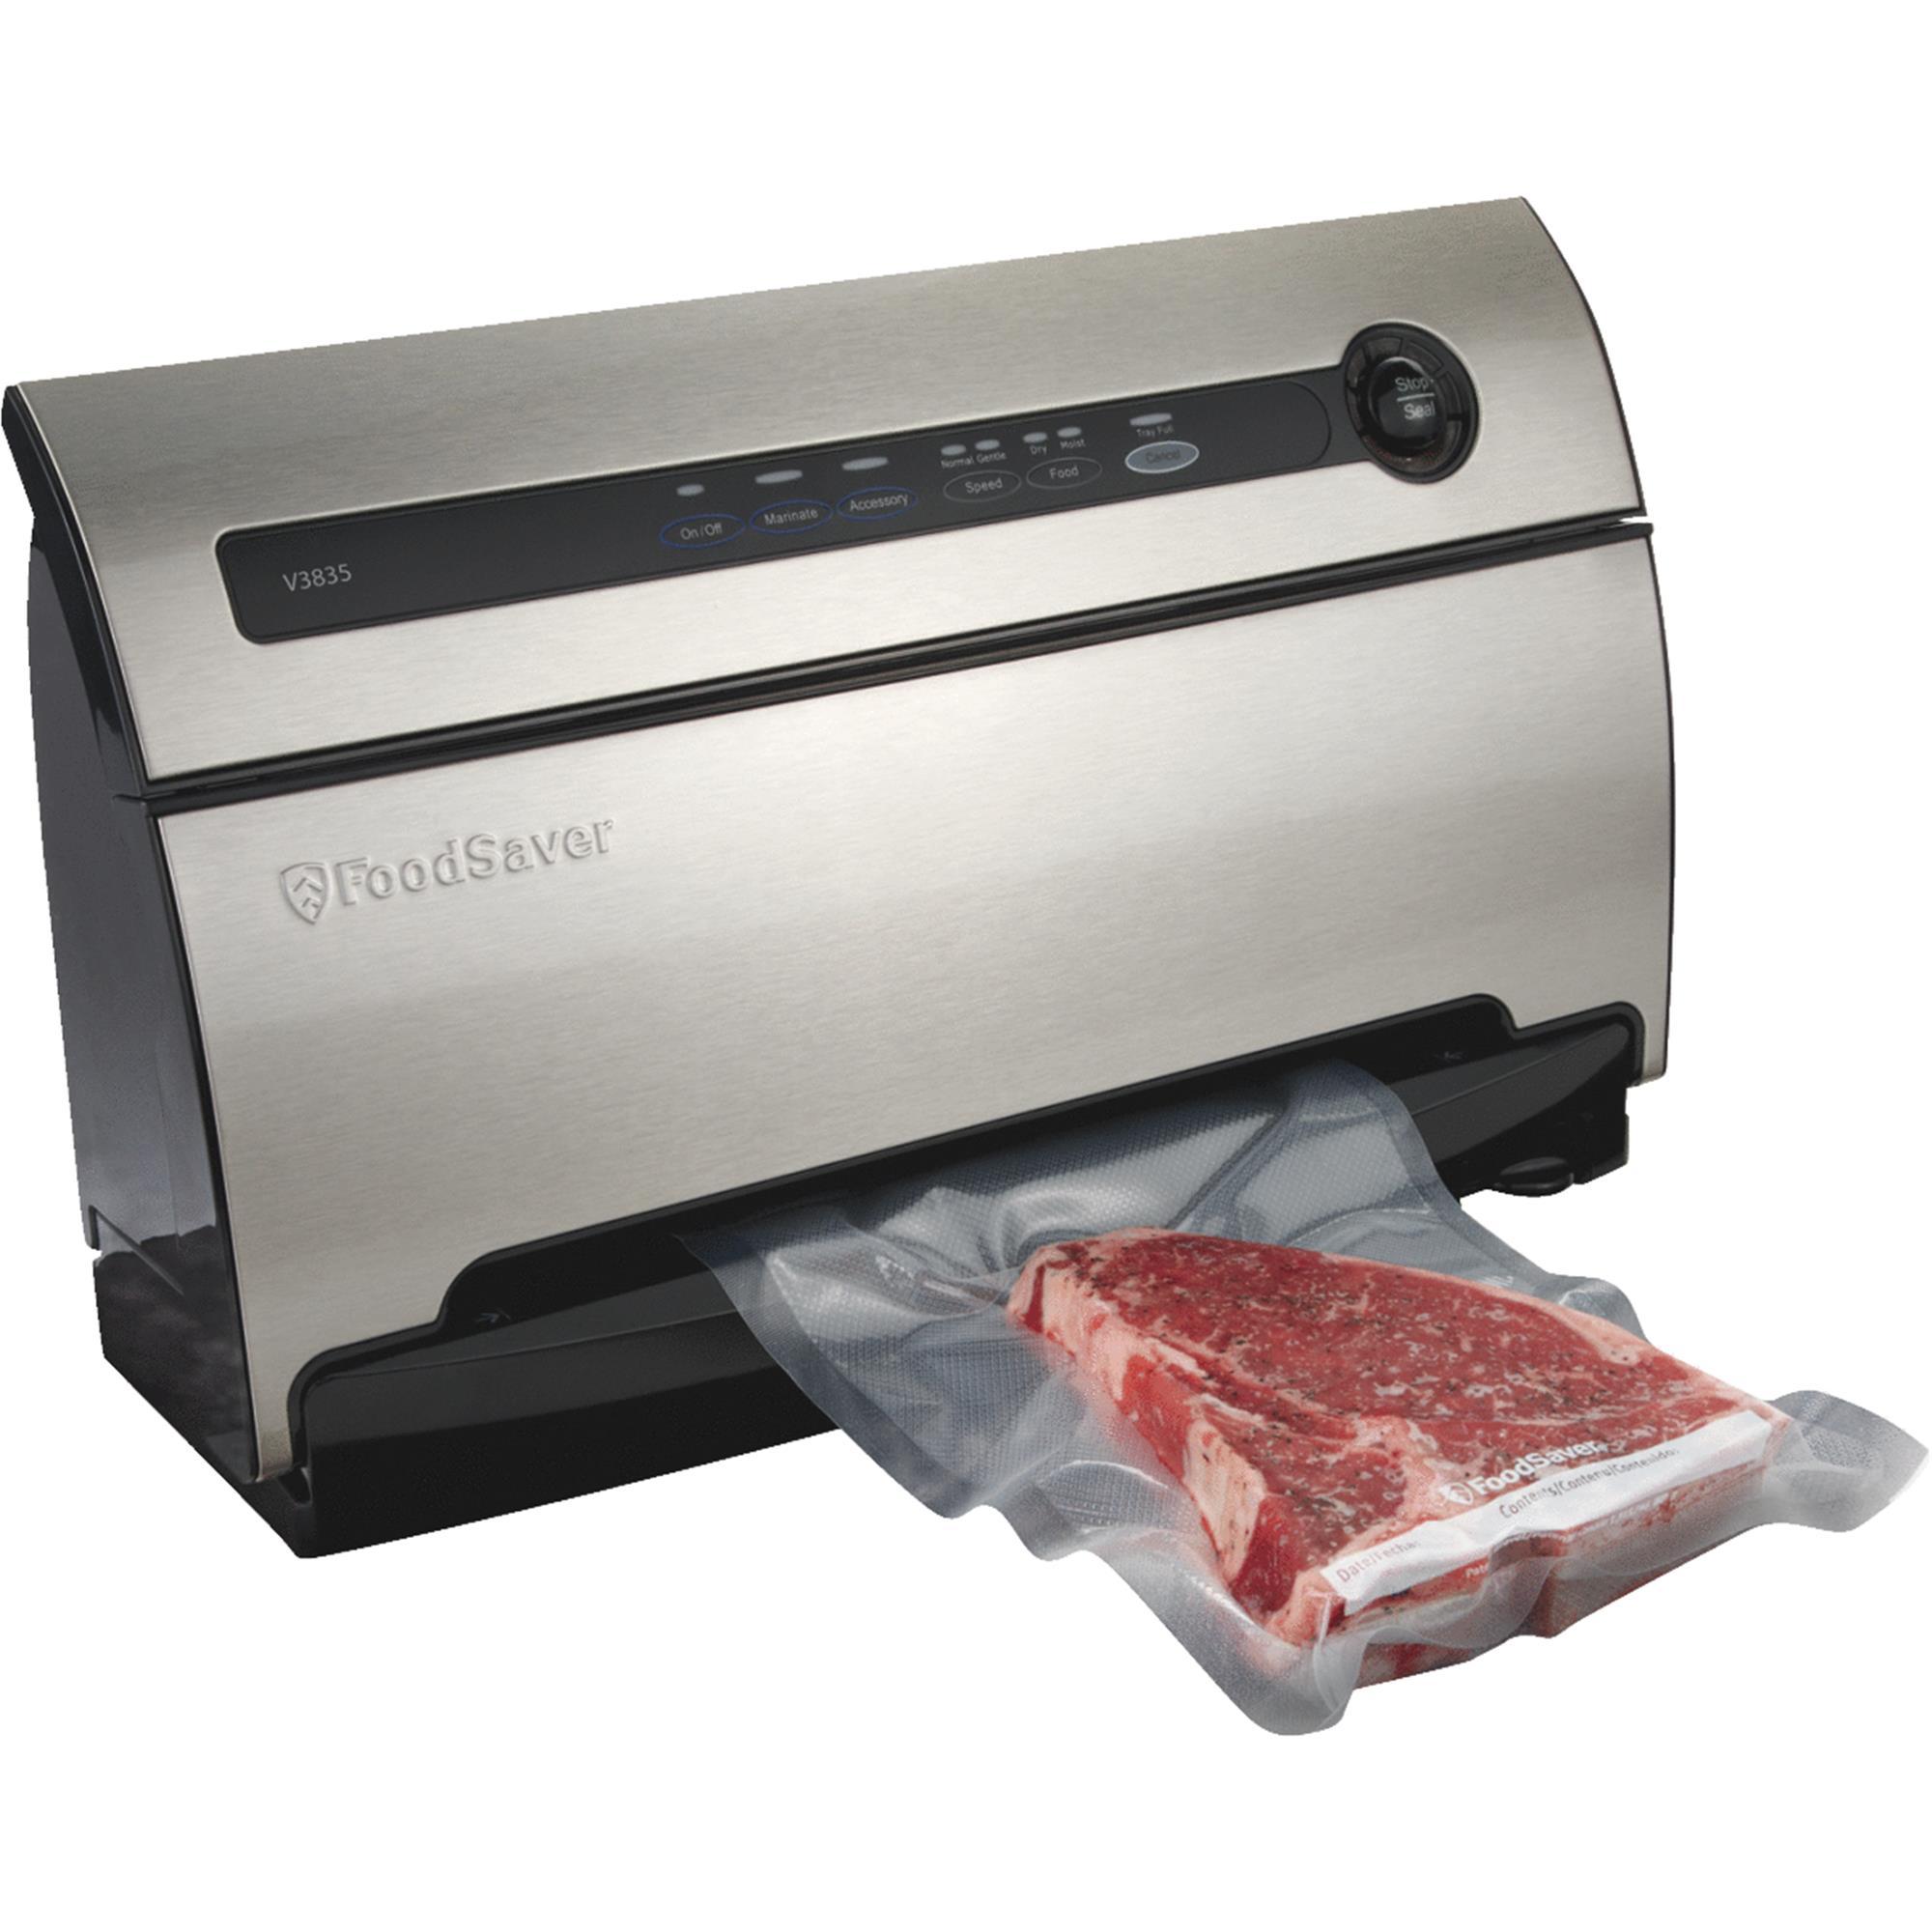 FoodSaver SmartSeal Vacuum Food Sealer